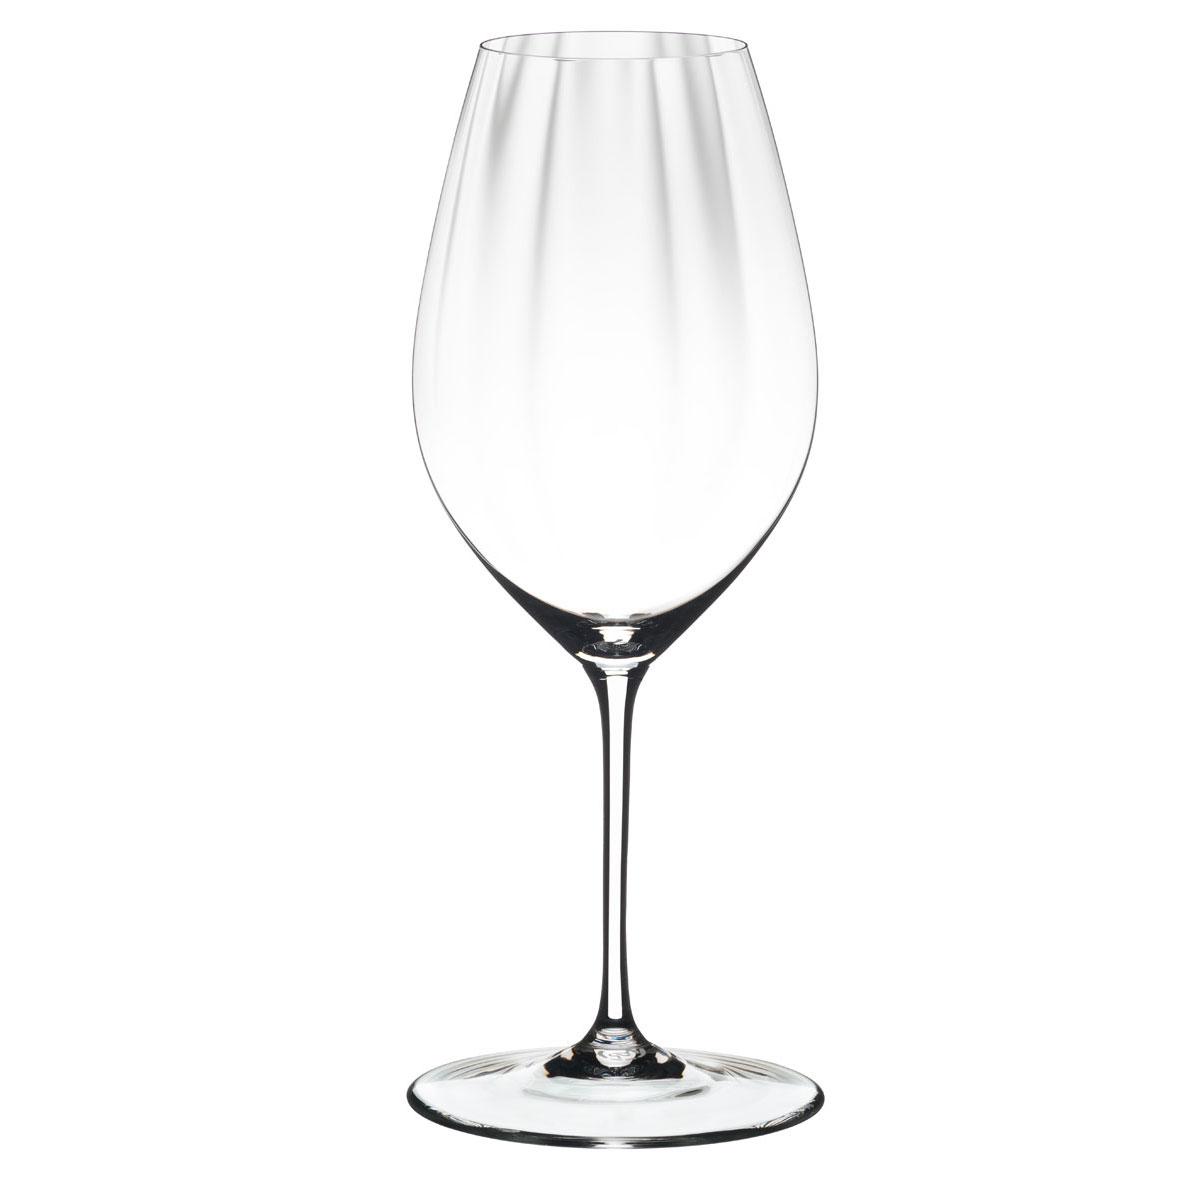 Riedel Performance Riesling Crystal Wine Glasses, Pair